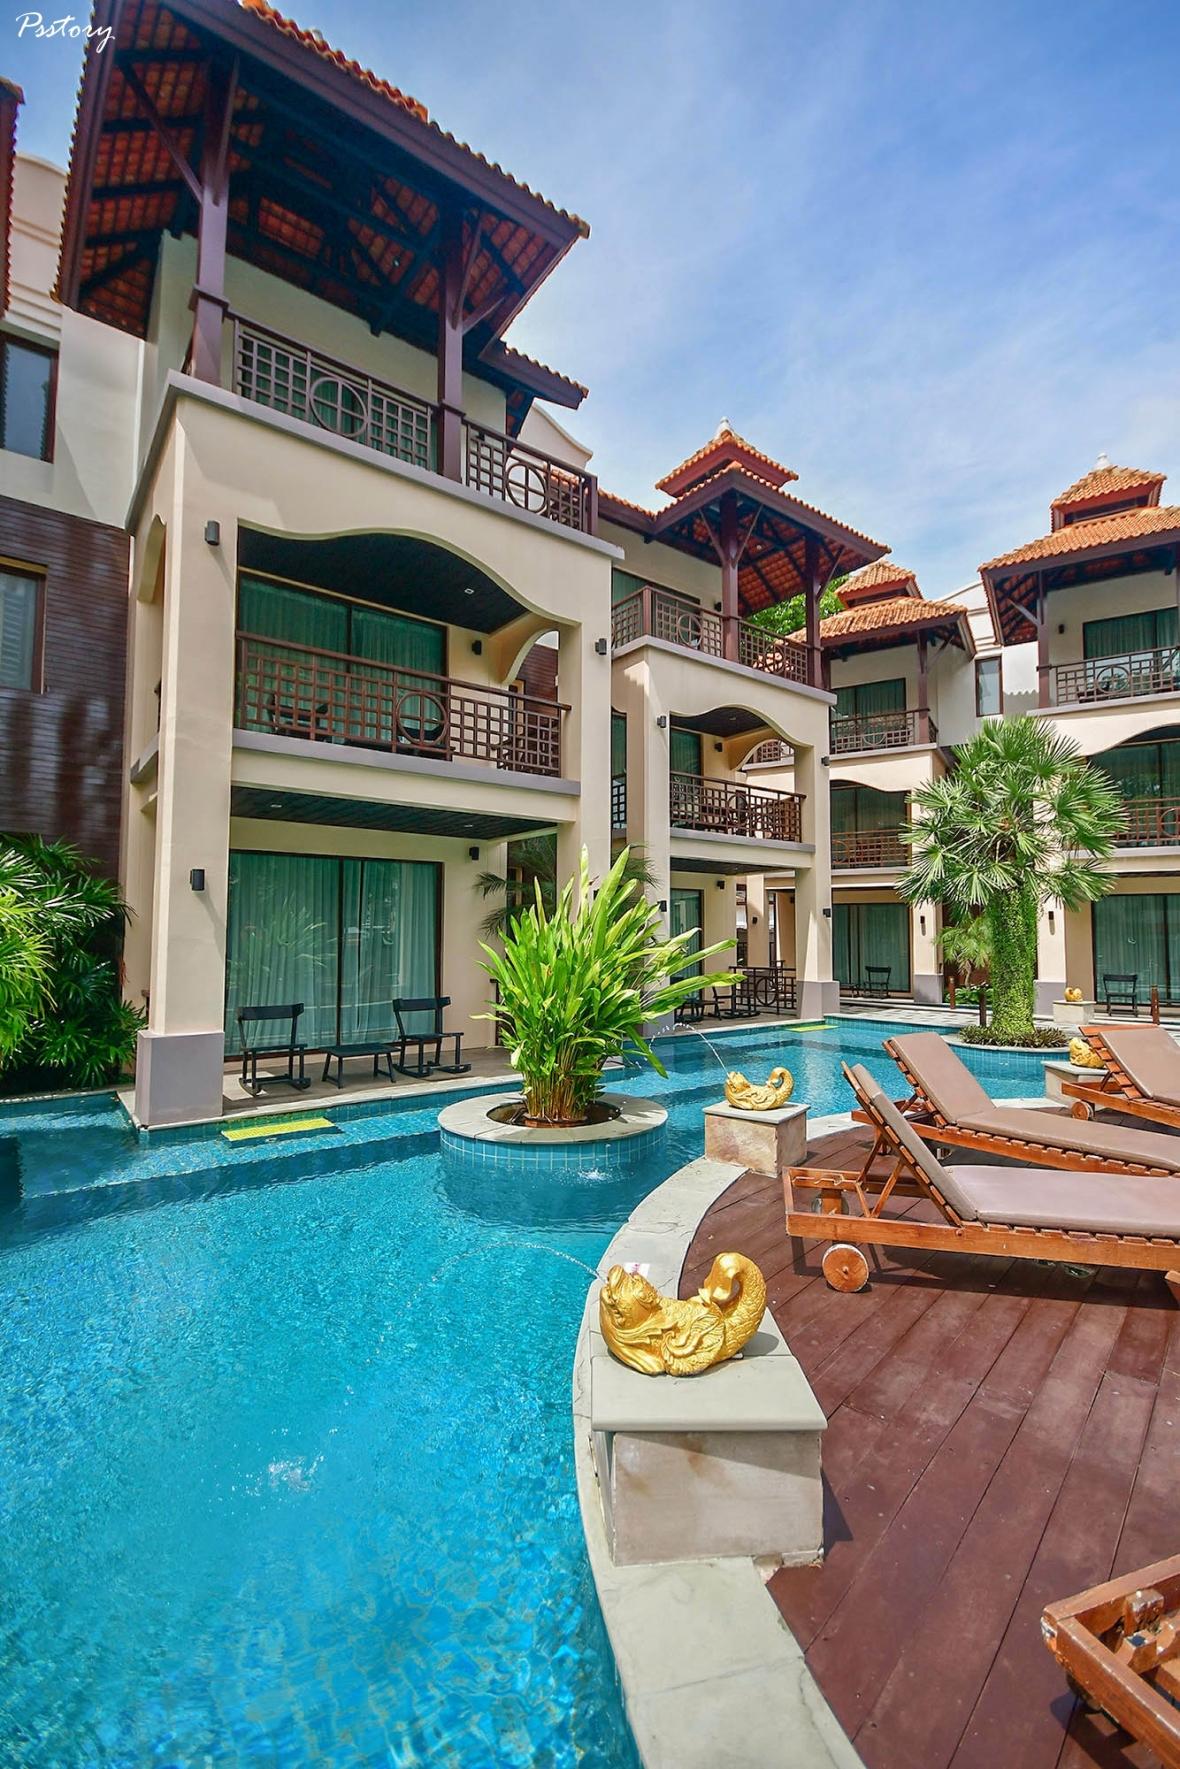 Long Beach Pattaya (13)